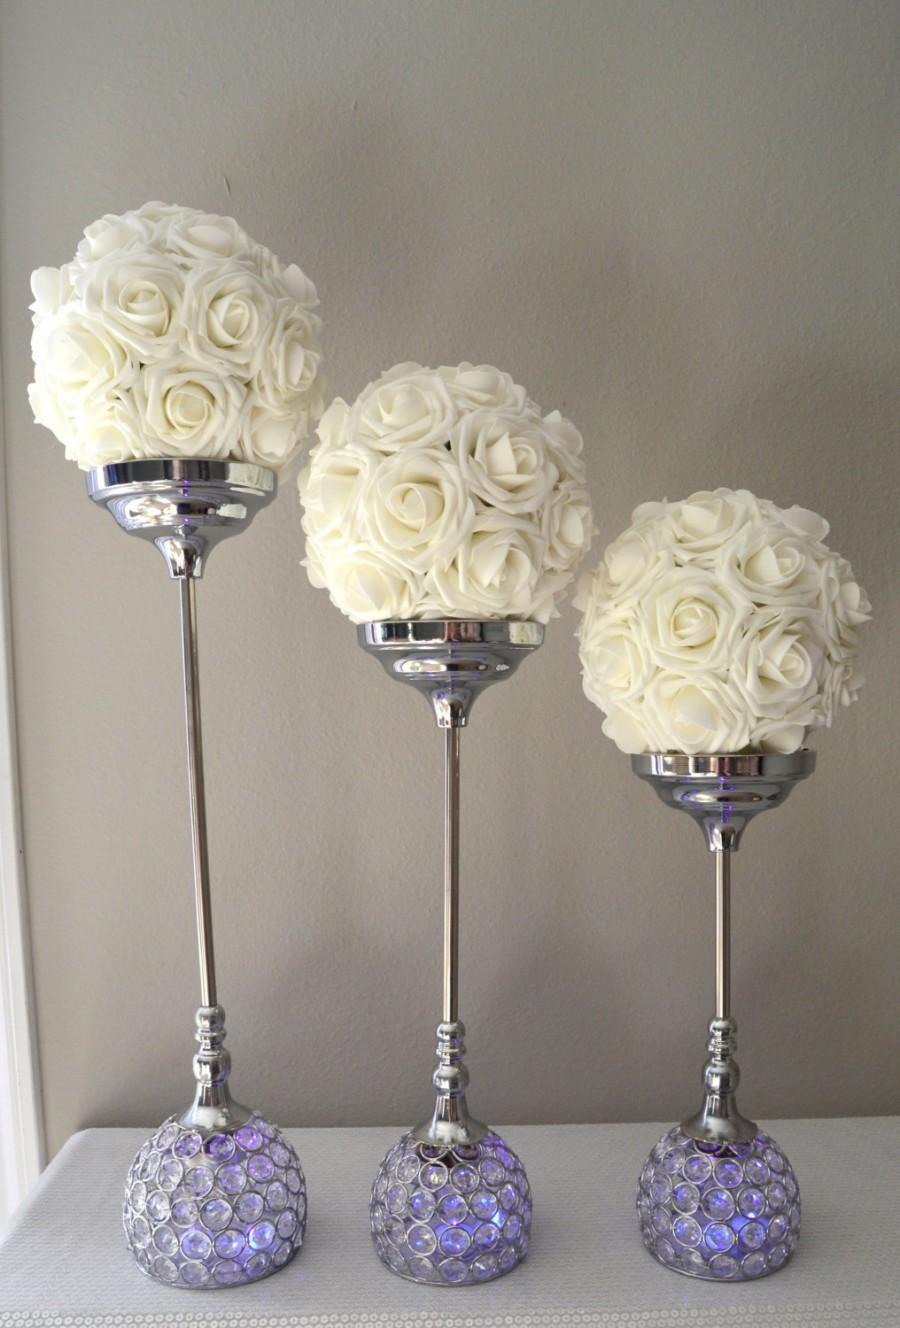 Fantastic Crystal Candle Holder SET OF 3 Silver Bling Rhinestone Flower Ball  FU46